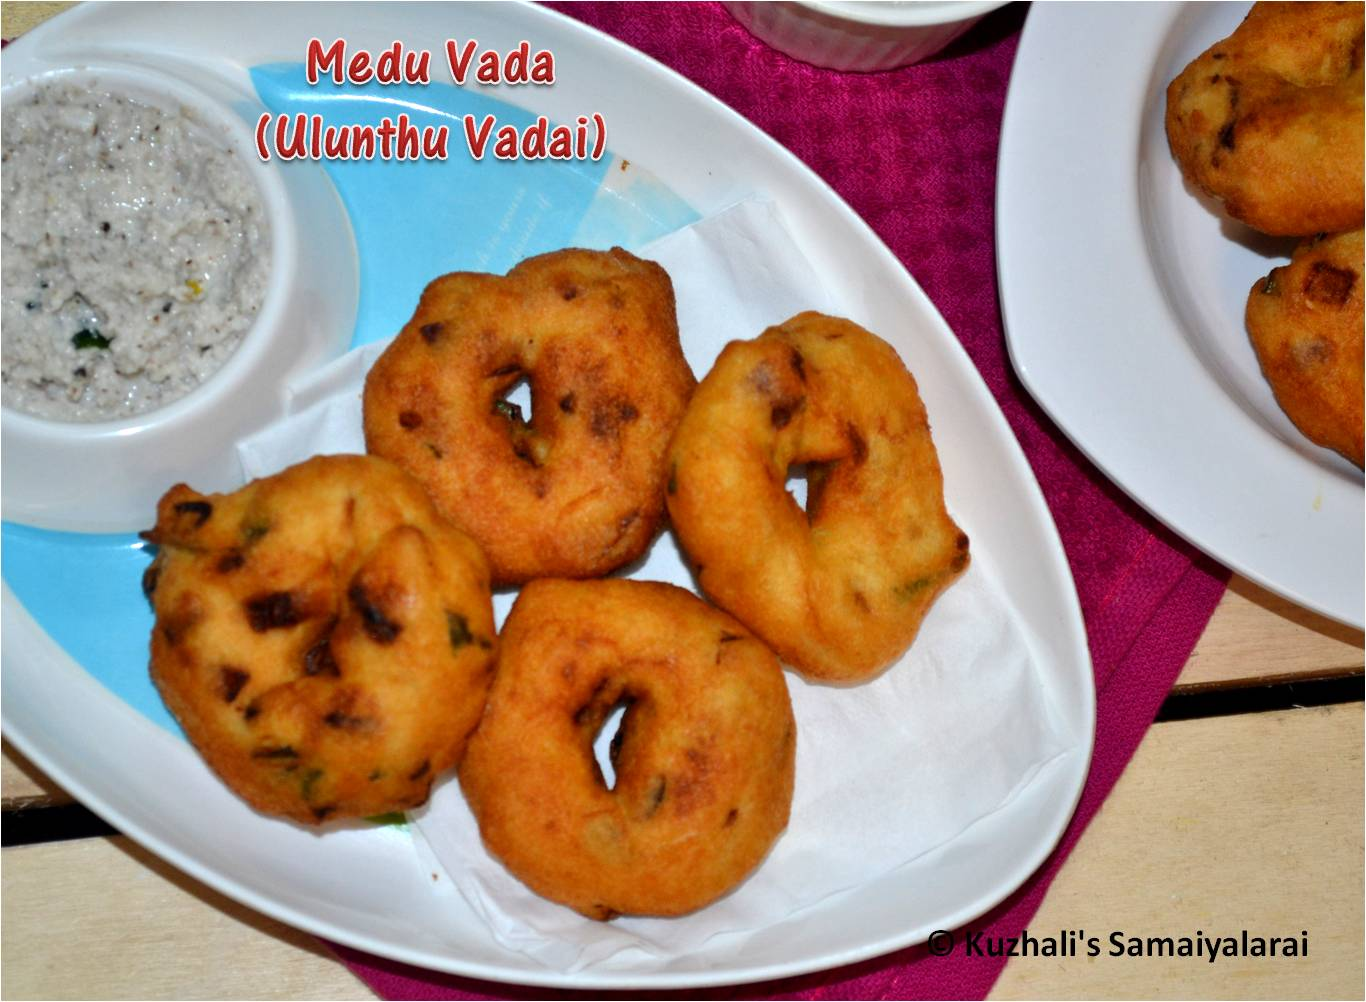 http://www.kuzhalisamaiyalarai.in/2018/01/medu-vada-urad-dhal-vadaulunthu-vadai.html